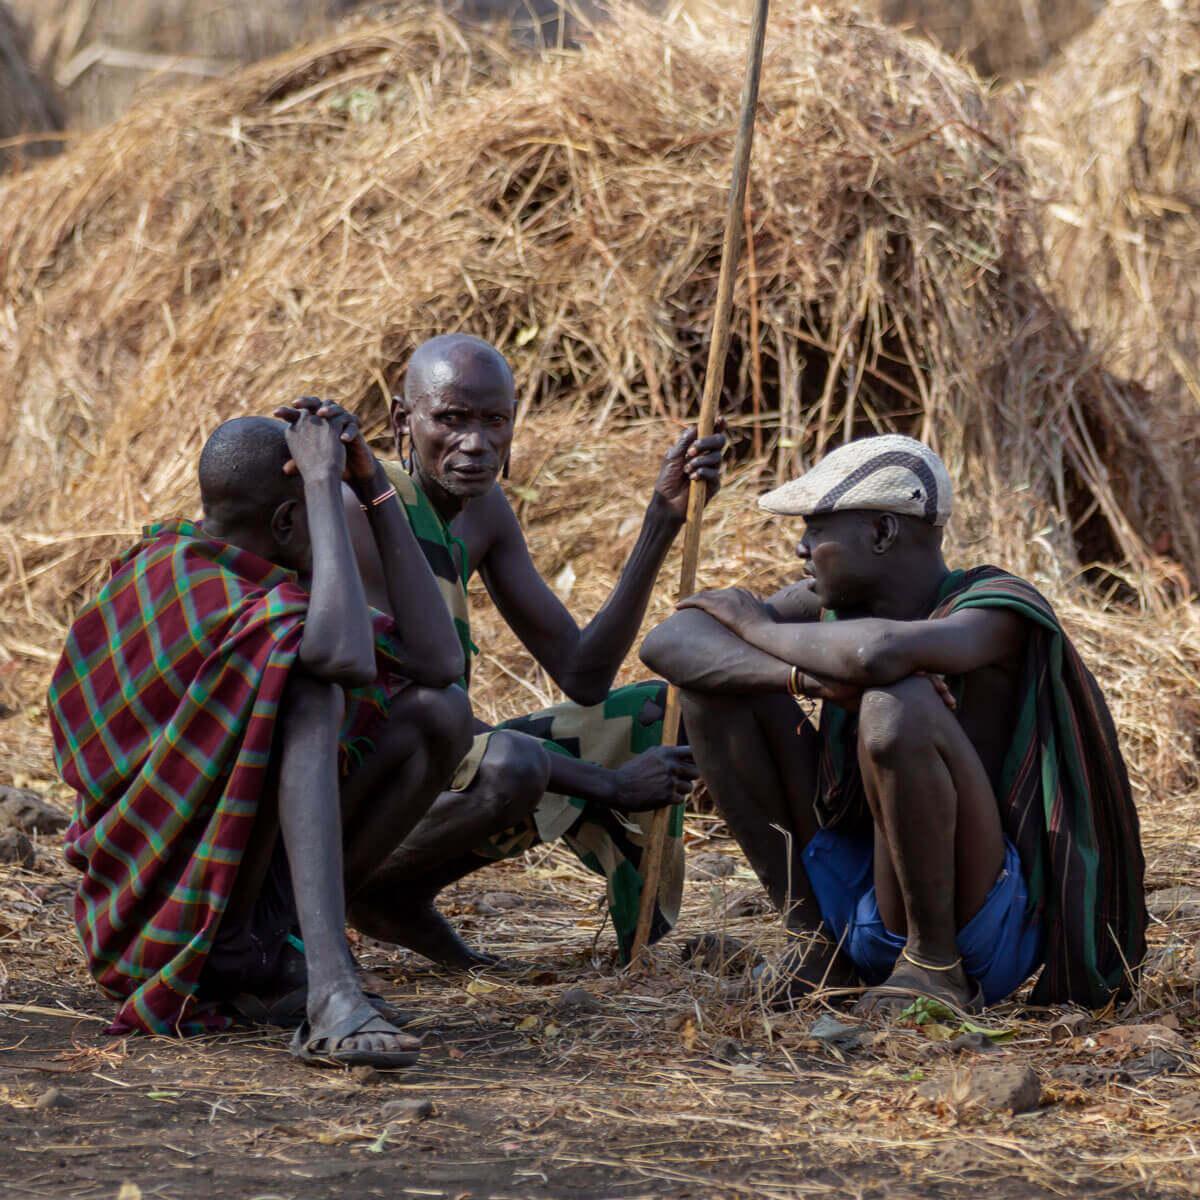 Ethiopia_adventures_traveling_Mursi_tribe_Jinka_Mago nationalpark_traveling_family_toru_Africa_country_religion_traditional_man_adventuresinethiopia